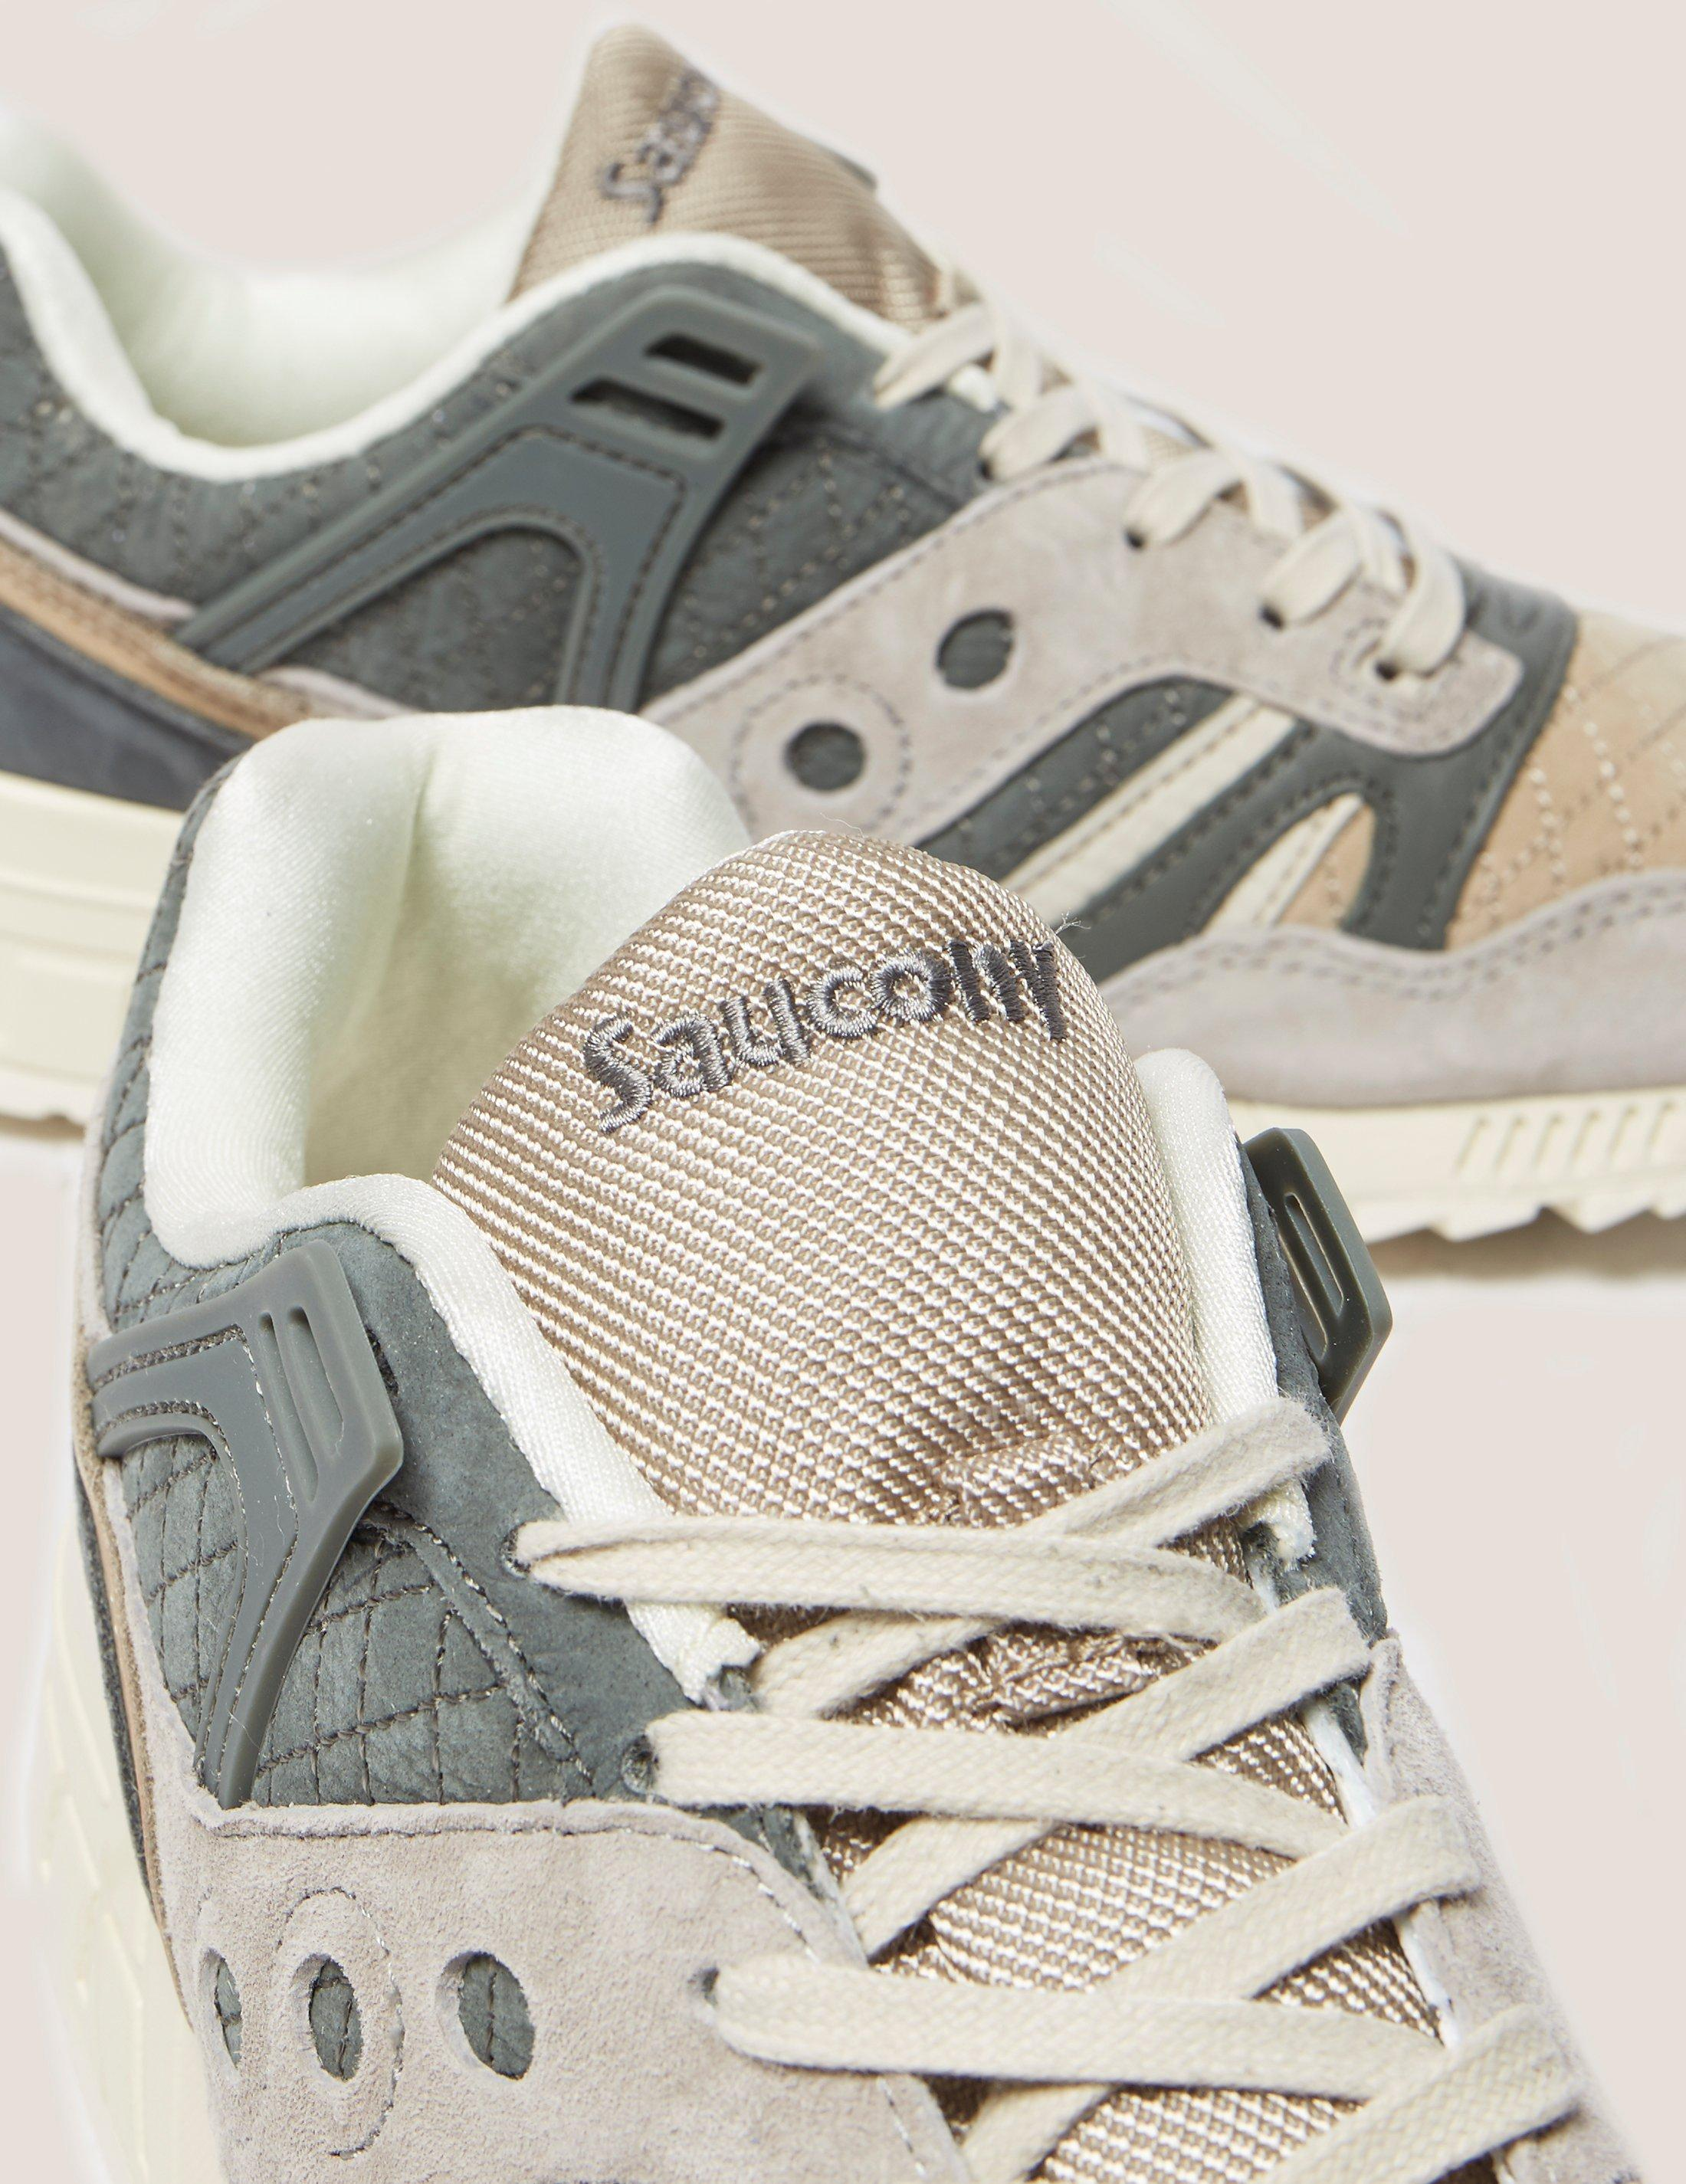 Saucony Suede Grid Sd Quilted in Grey/Beige (Grey) for Men